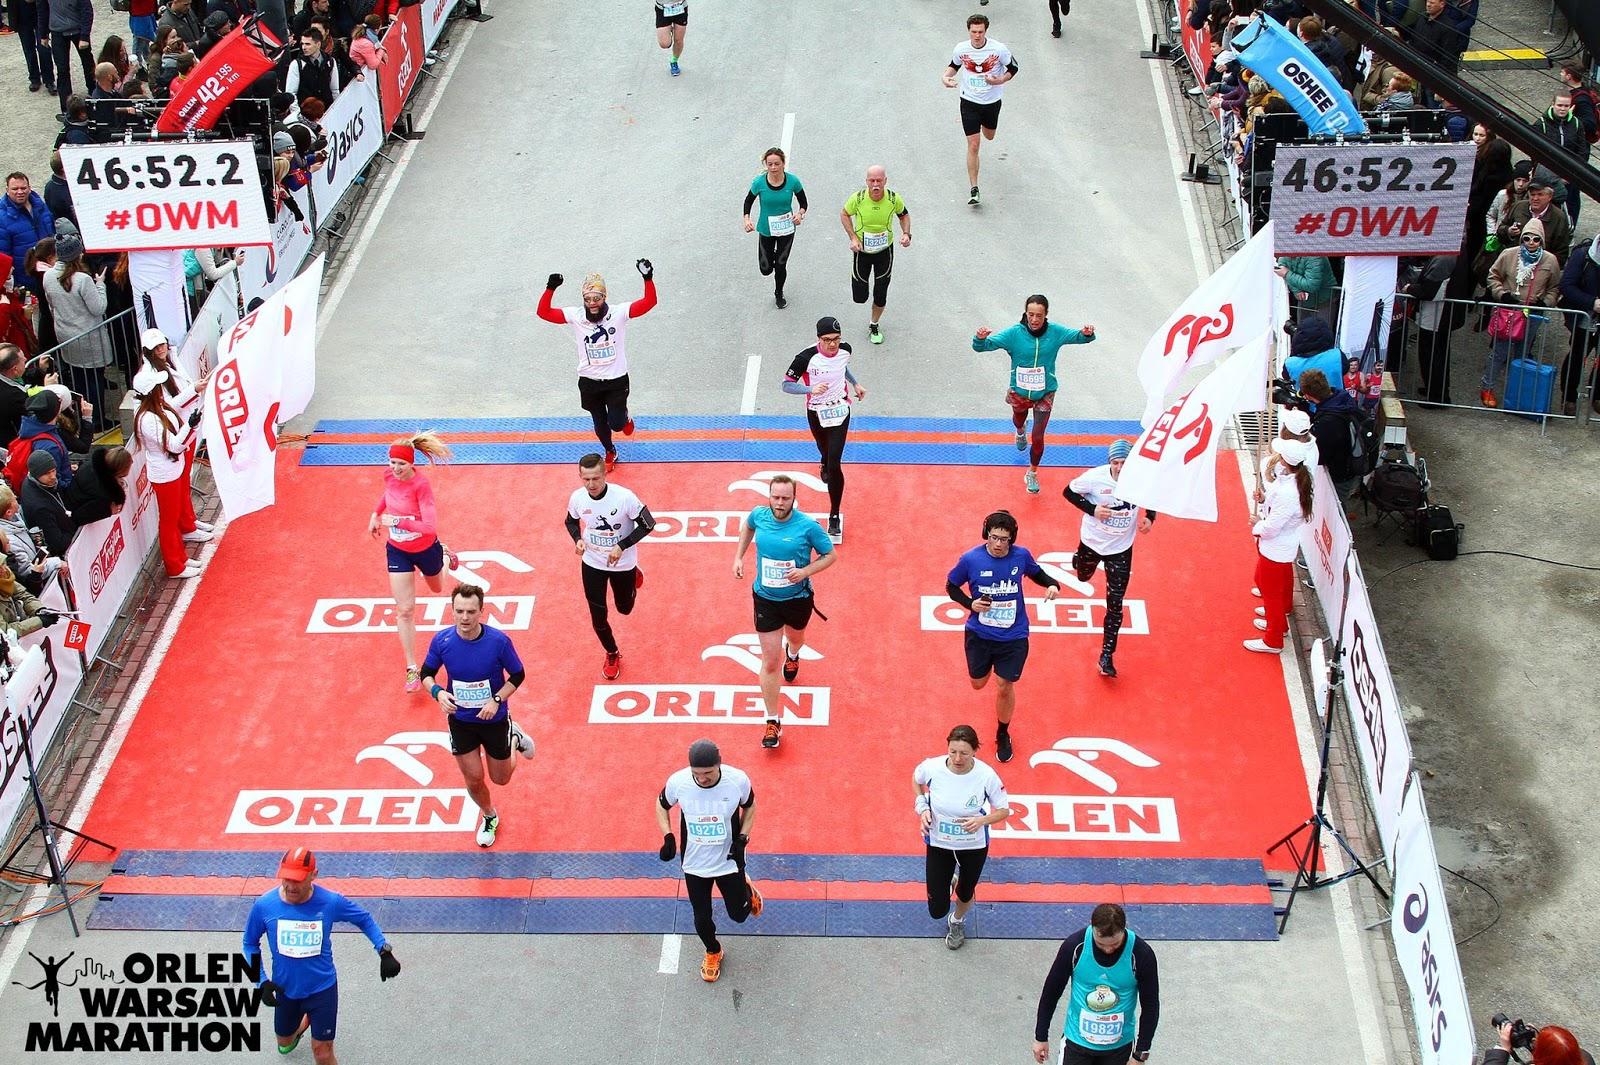 Meta 10km Orlen Warsaw Maraton